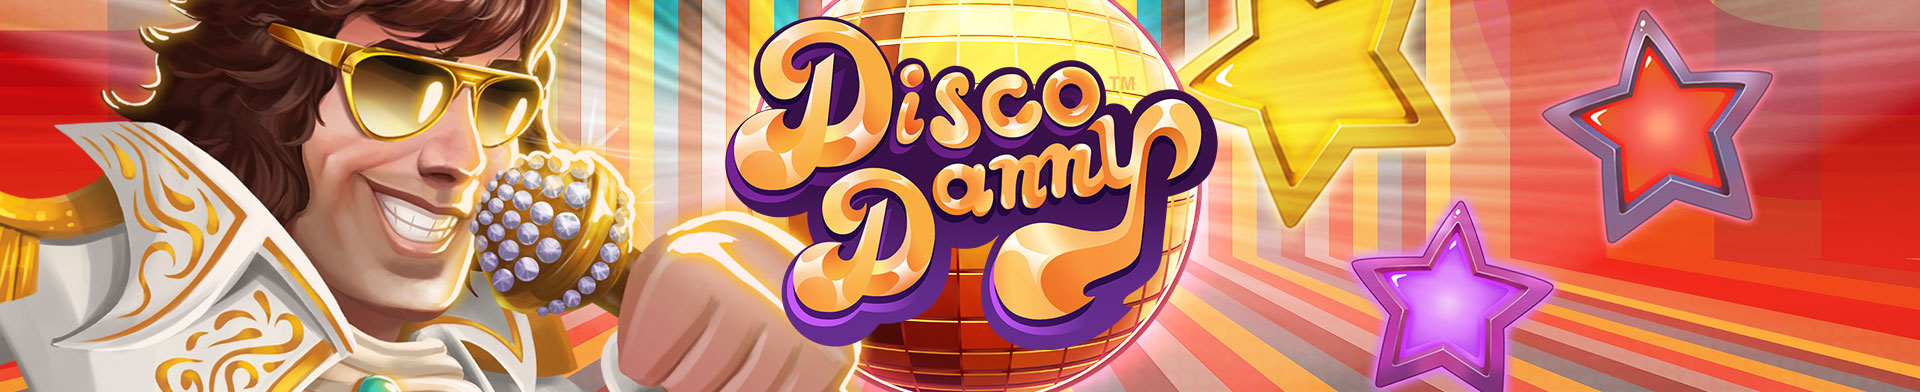 Disco Danny Banner